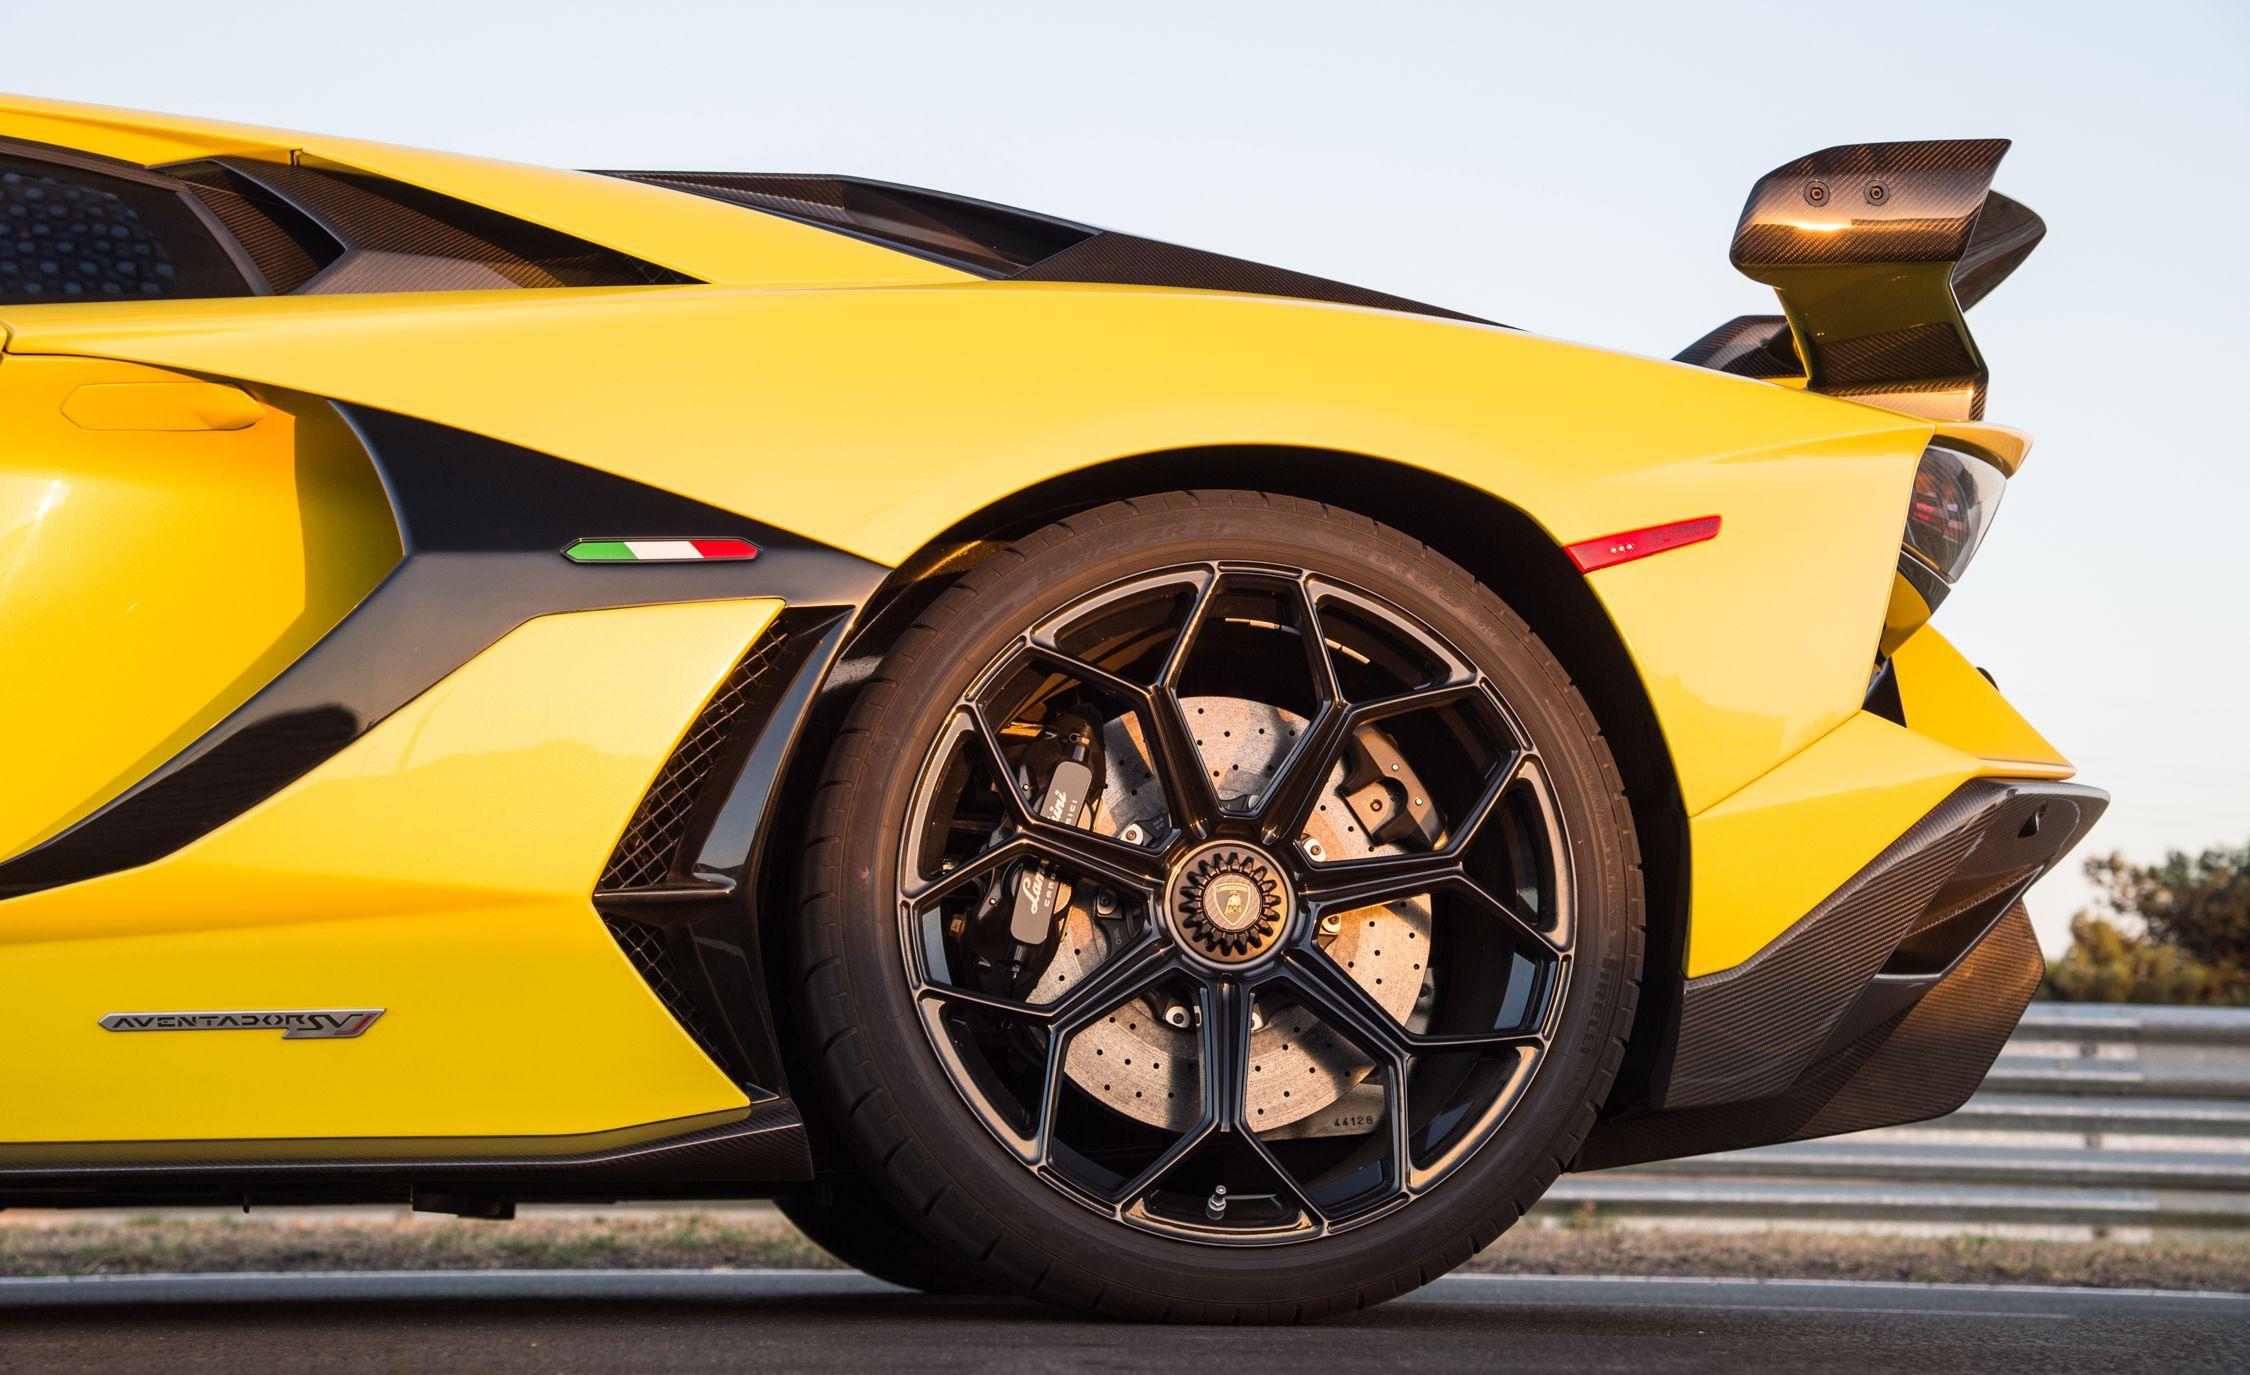 2019 Lamborghini Aventador SVJ Wheel Wallpaper (11)